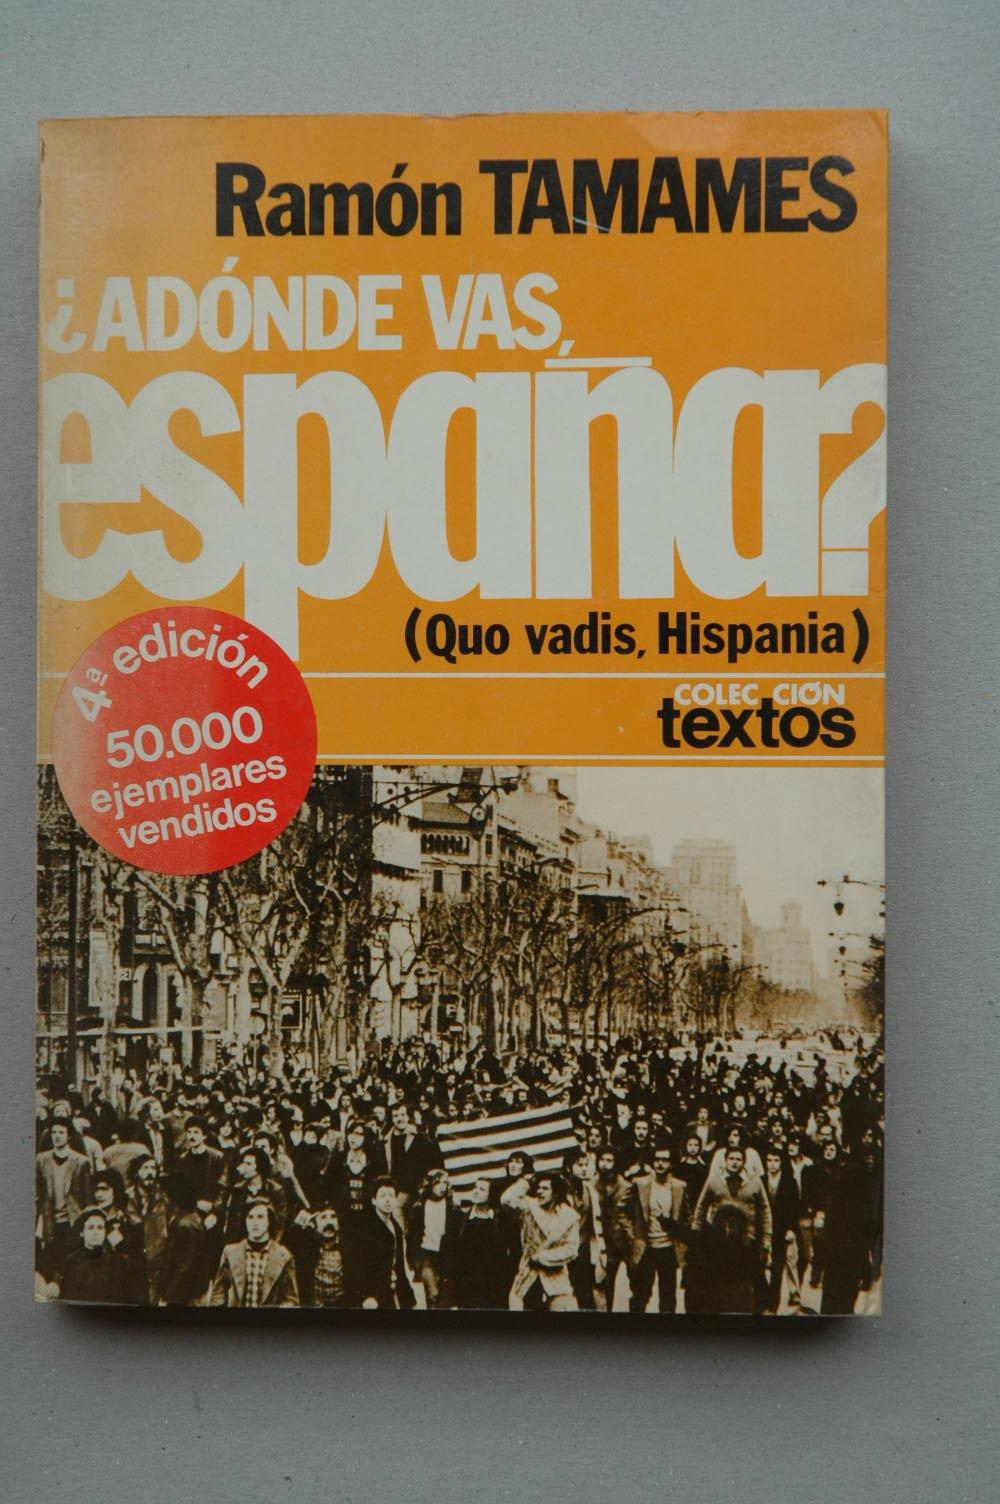 Adónde vas, España?: Quo vadis, Hispania ; con un prefacio ...